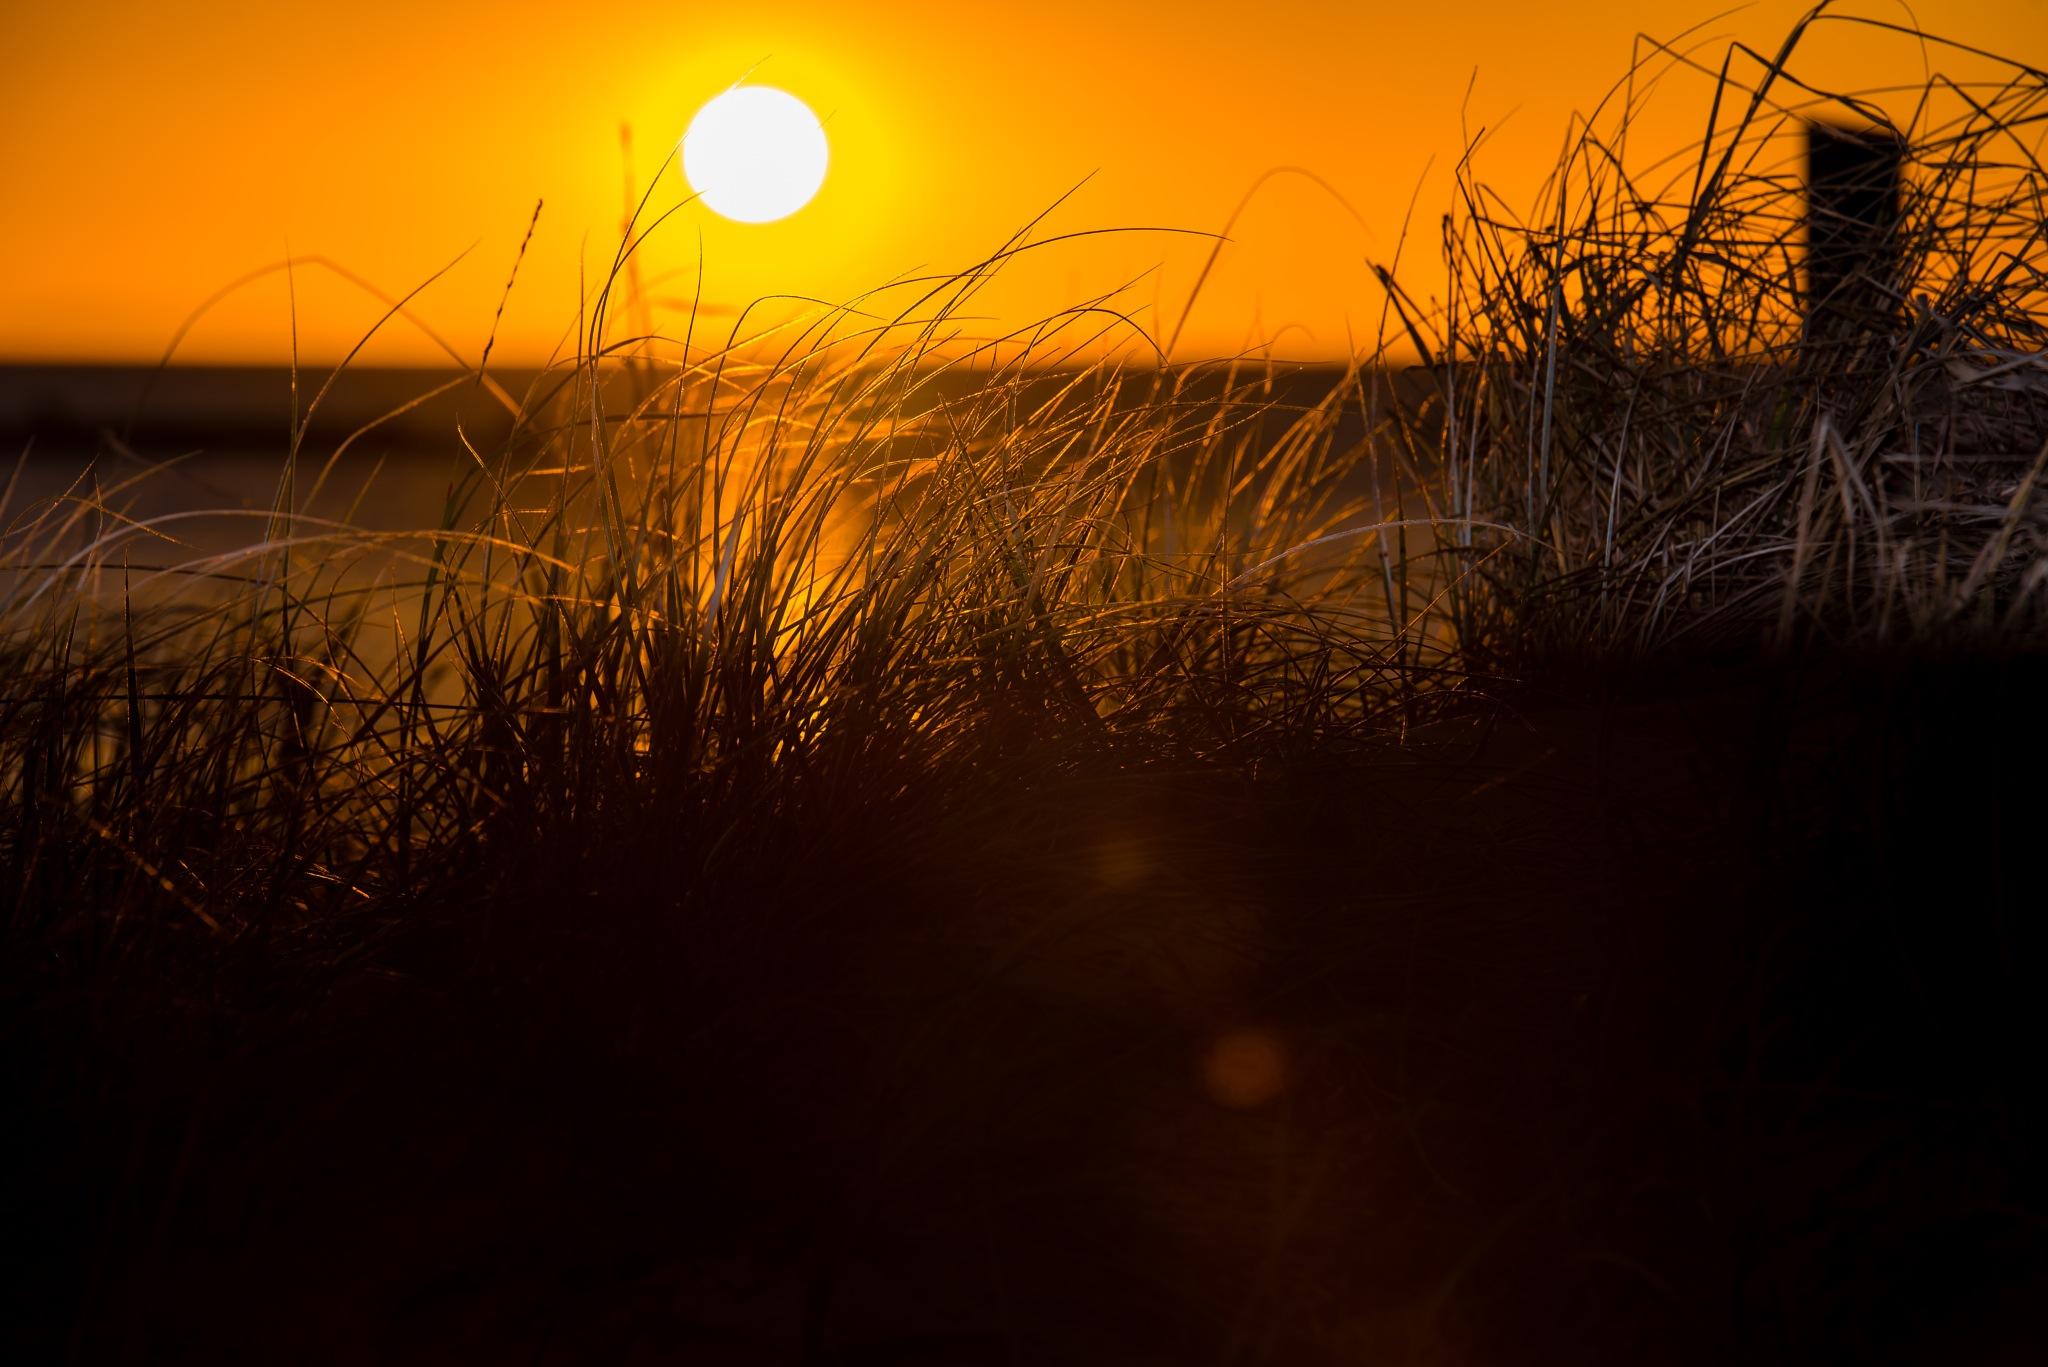 sunset  by Daltons photography